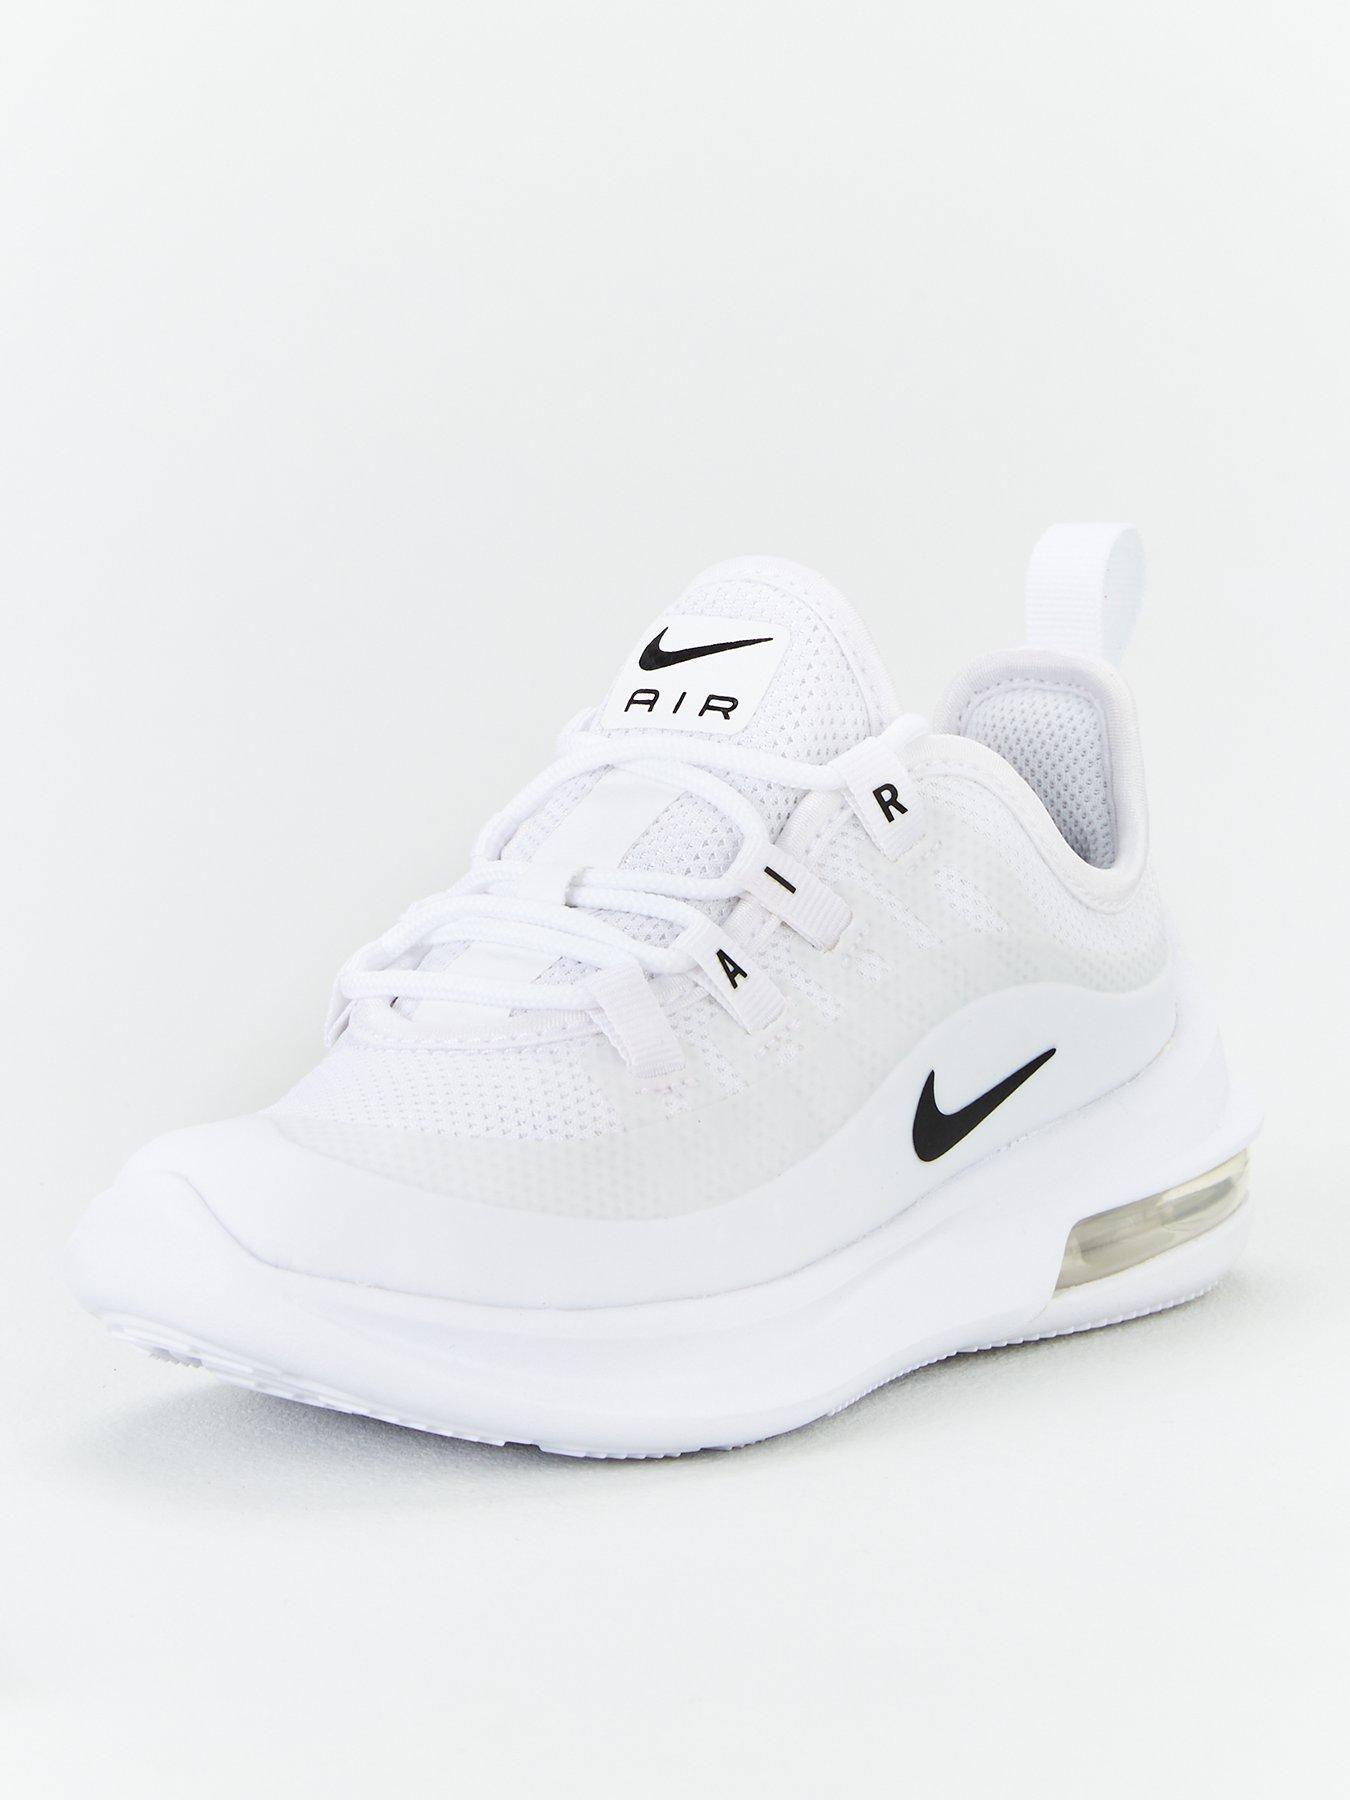 Nike Nike Air Max Axis Childrens